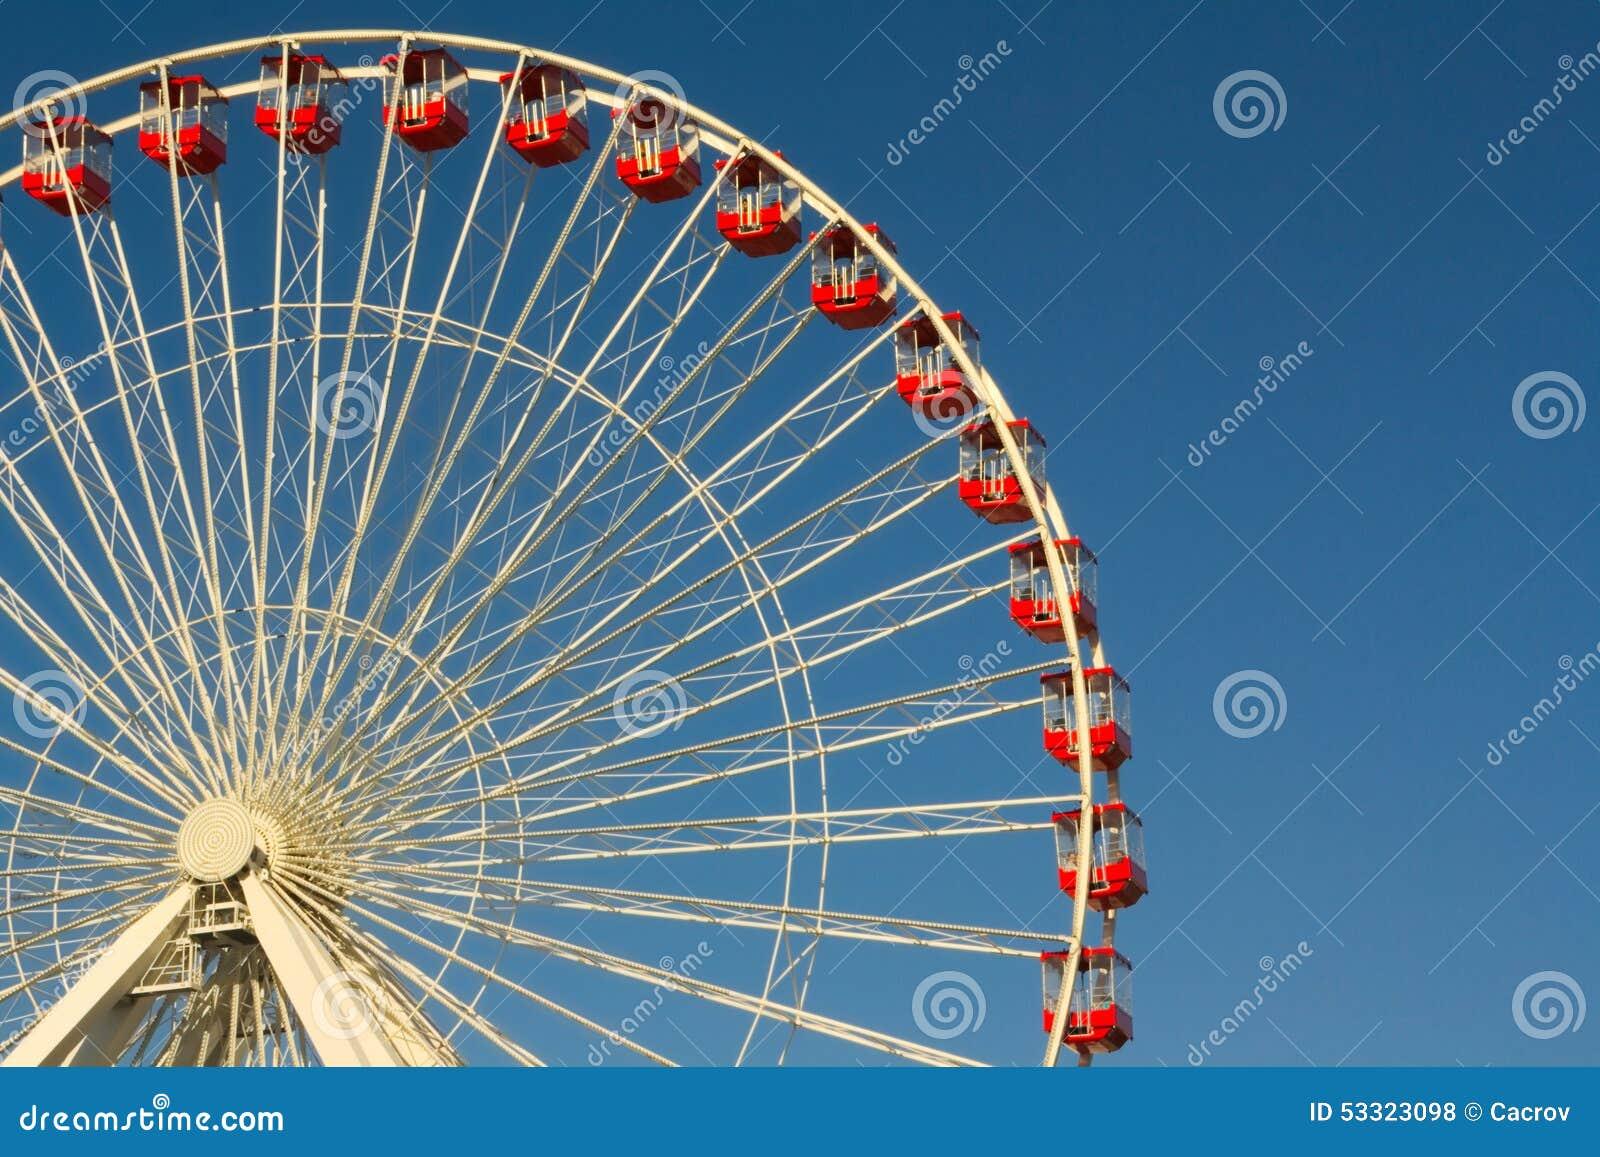 Download Ferris Wheel stock photo. Image of harbor, pier, lake - 53323098